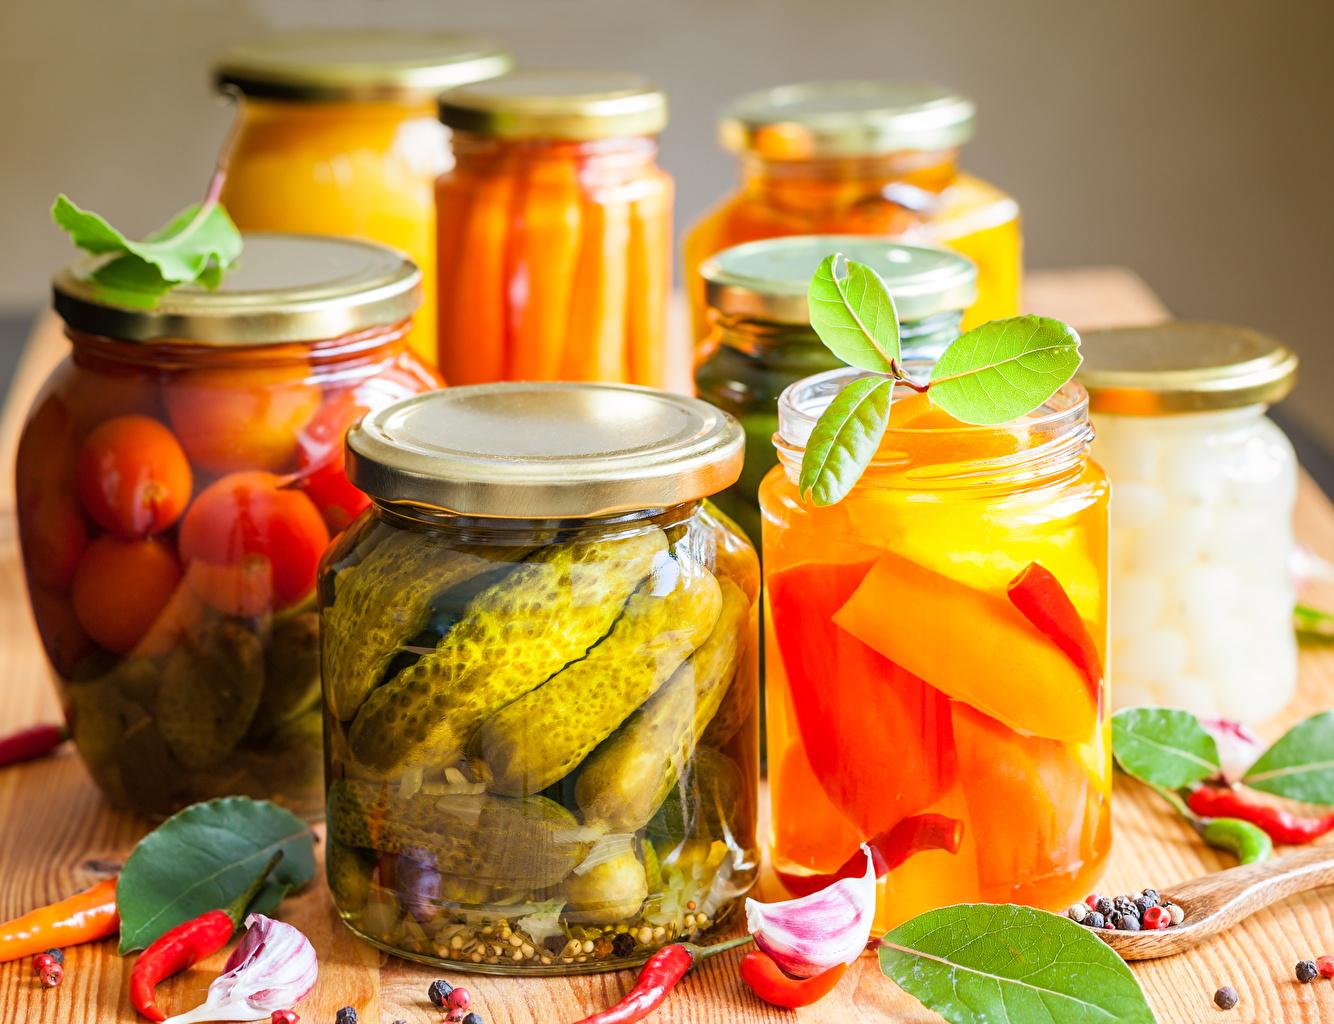 Wallpapers Cucumbers Jar Allium sativum Food Vegetables Garlic